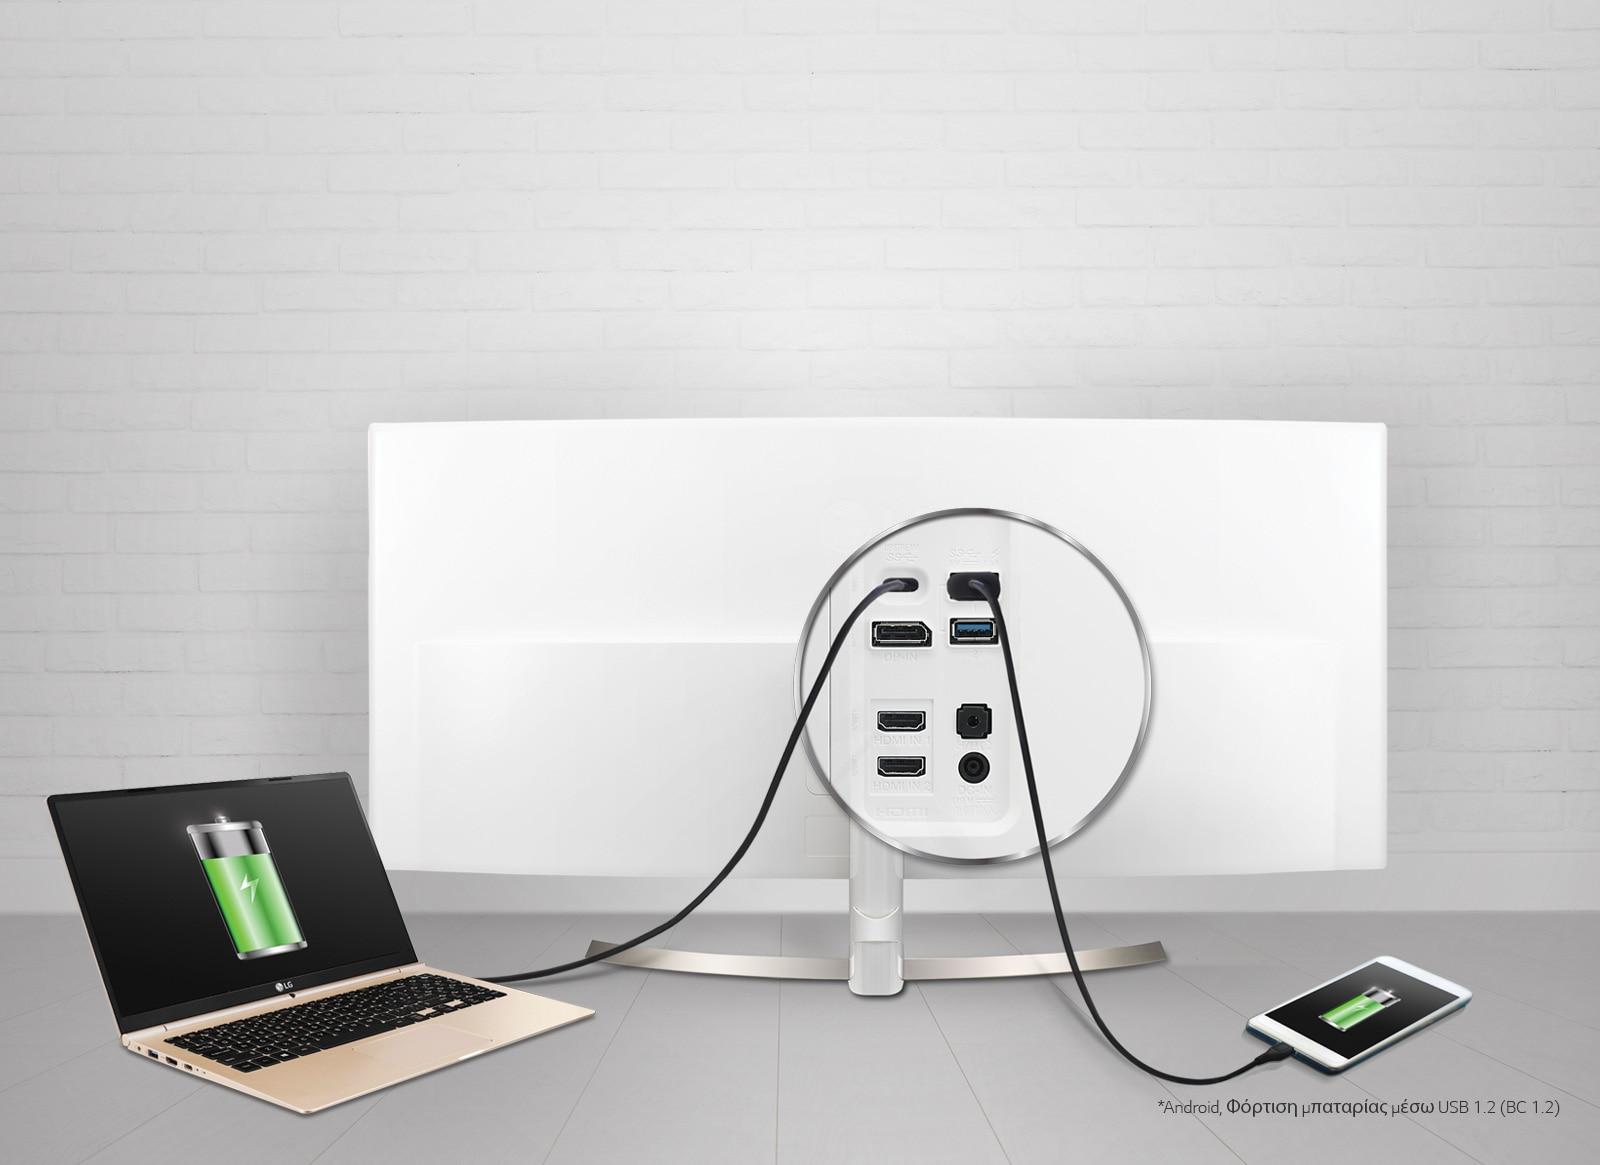 USB Type-C™ & ταχεία φόρτιση μέσω USB 3.0